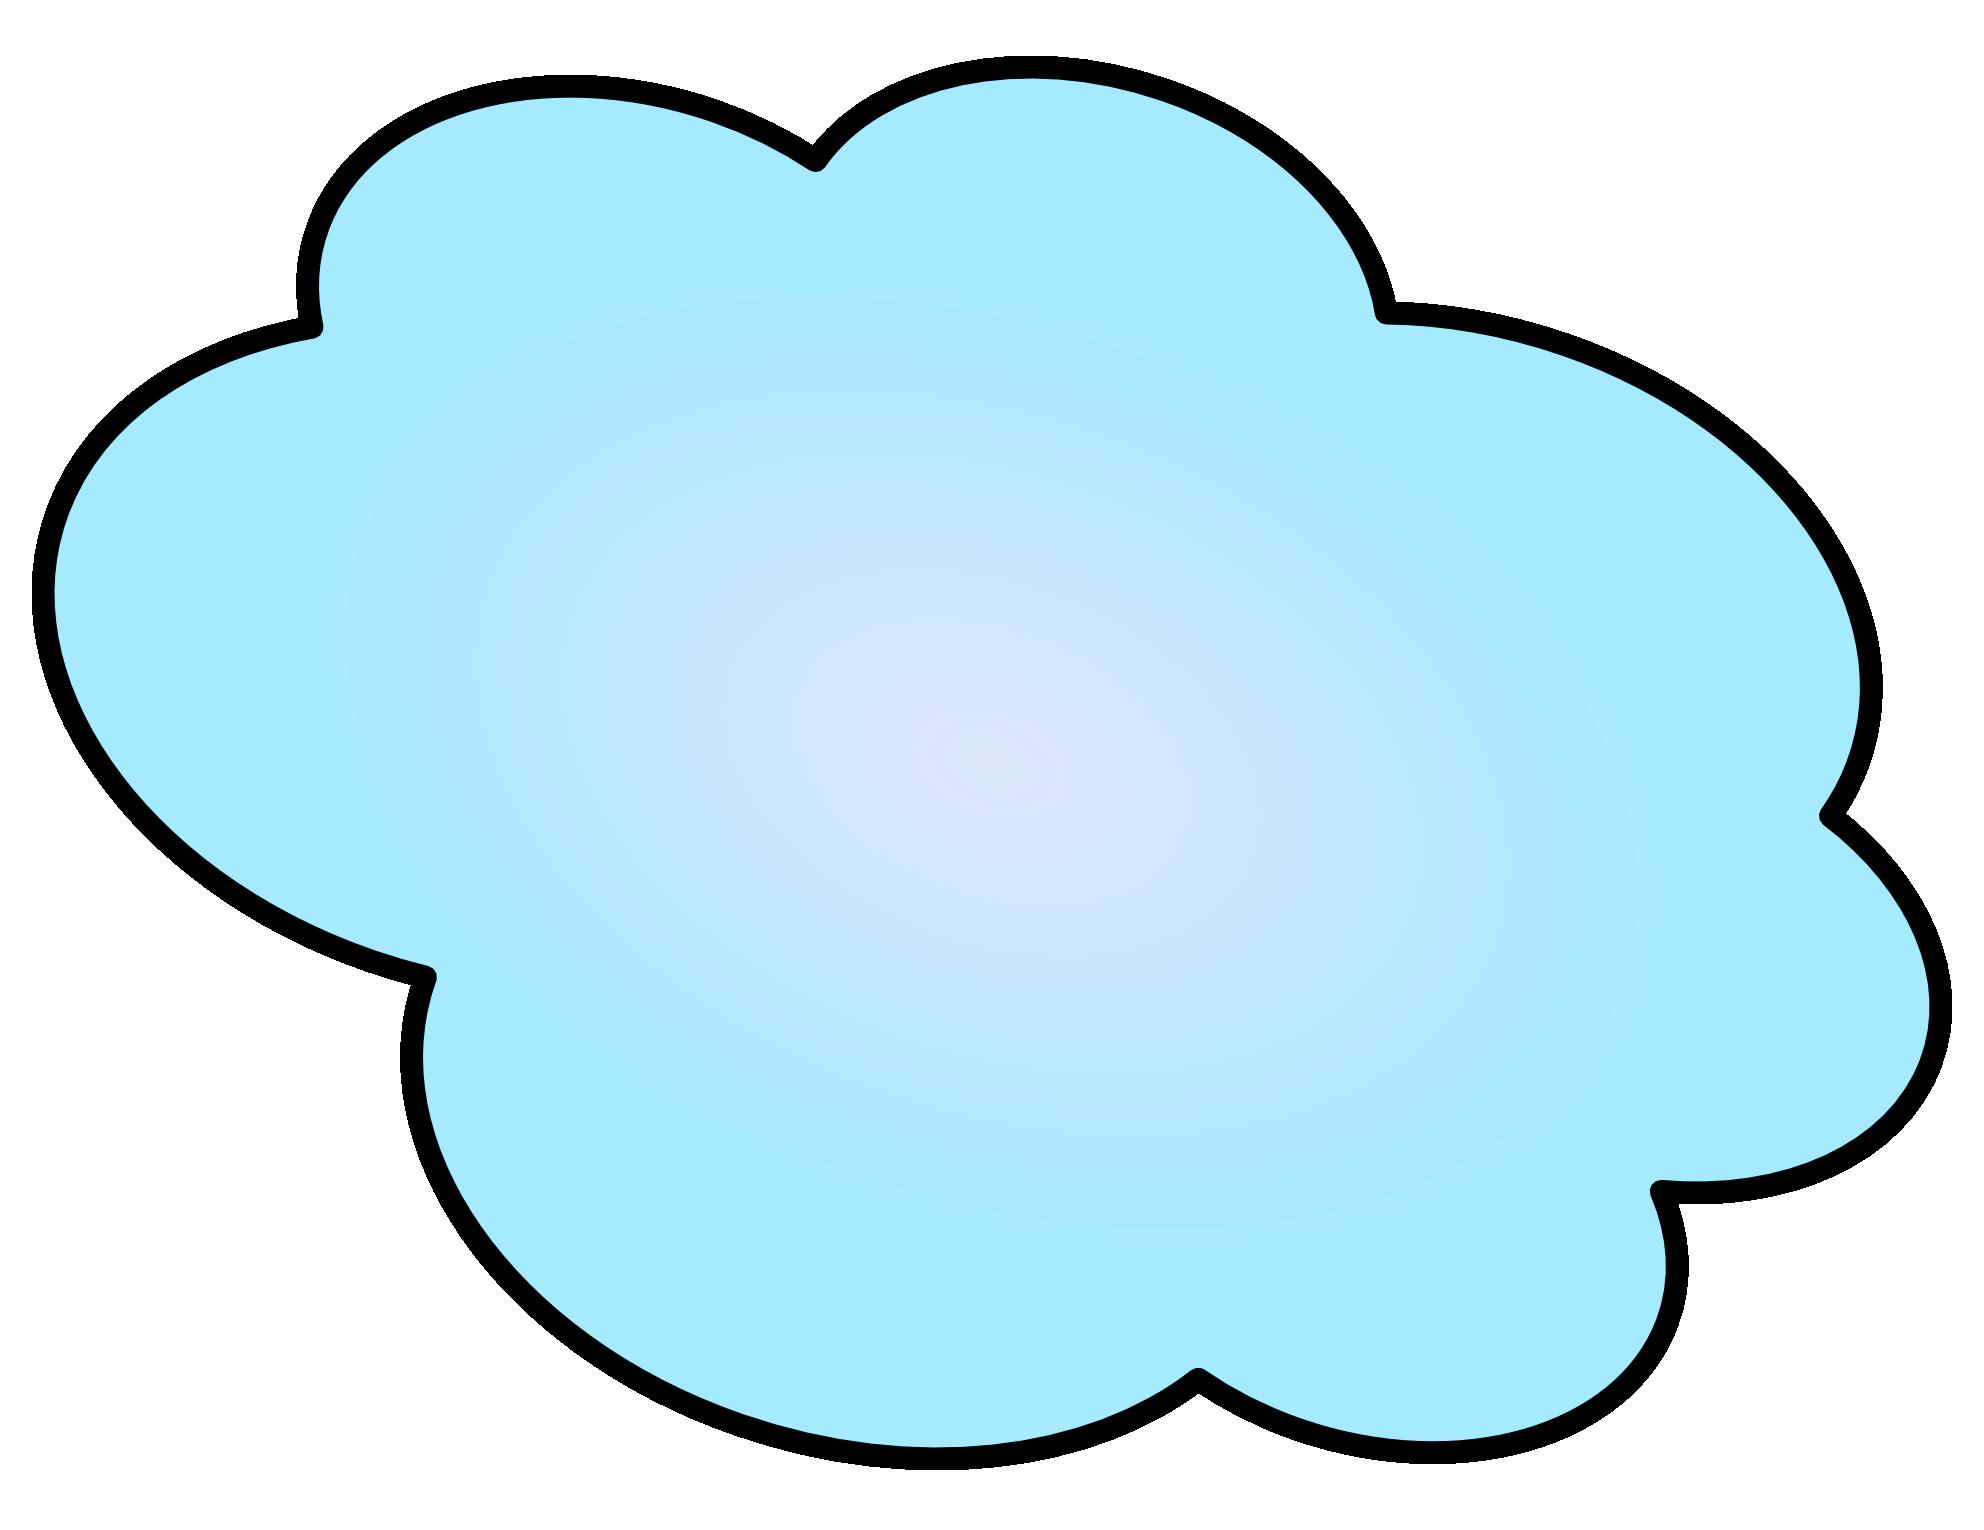 Clouds clipart swirl. Cloud png transparent image